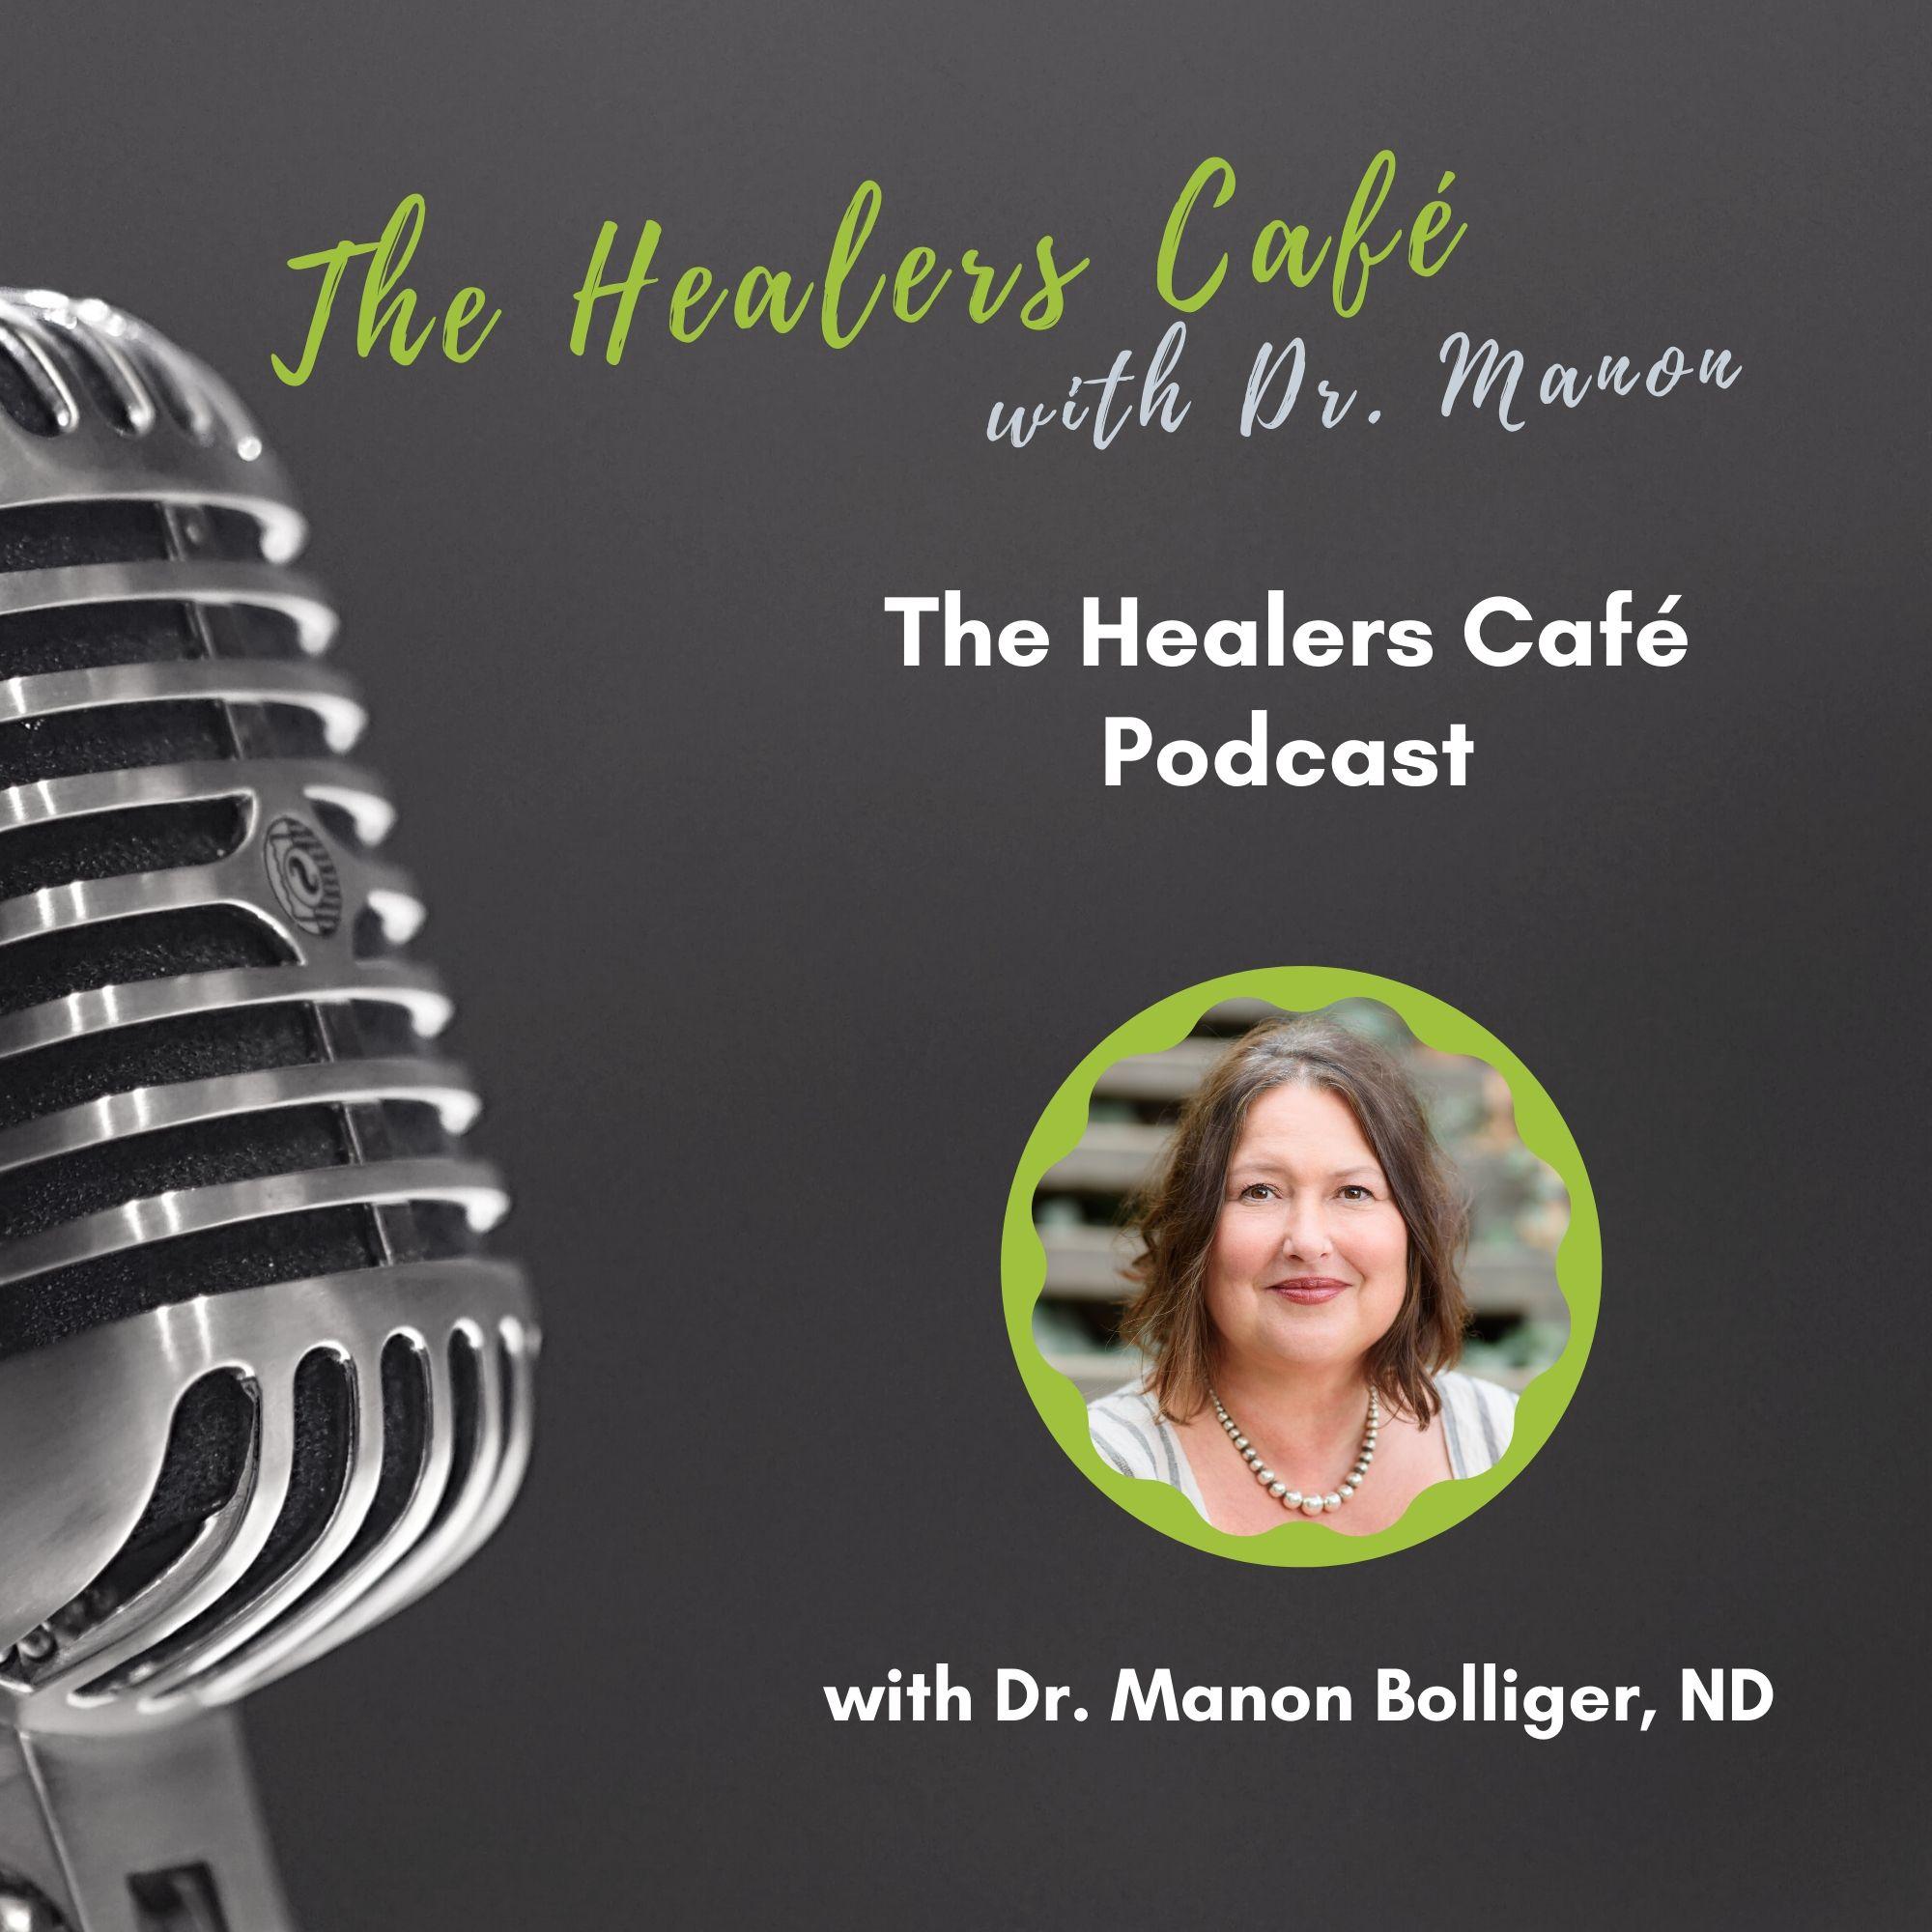 The Healers Café show art